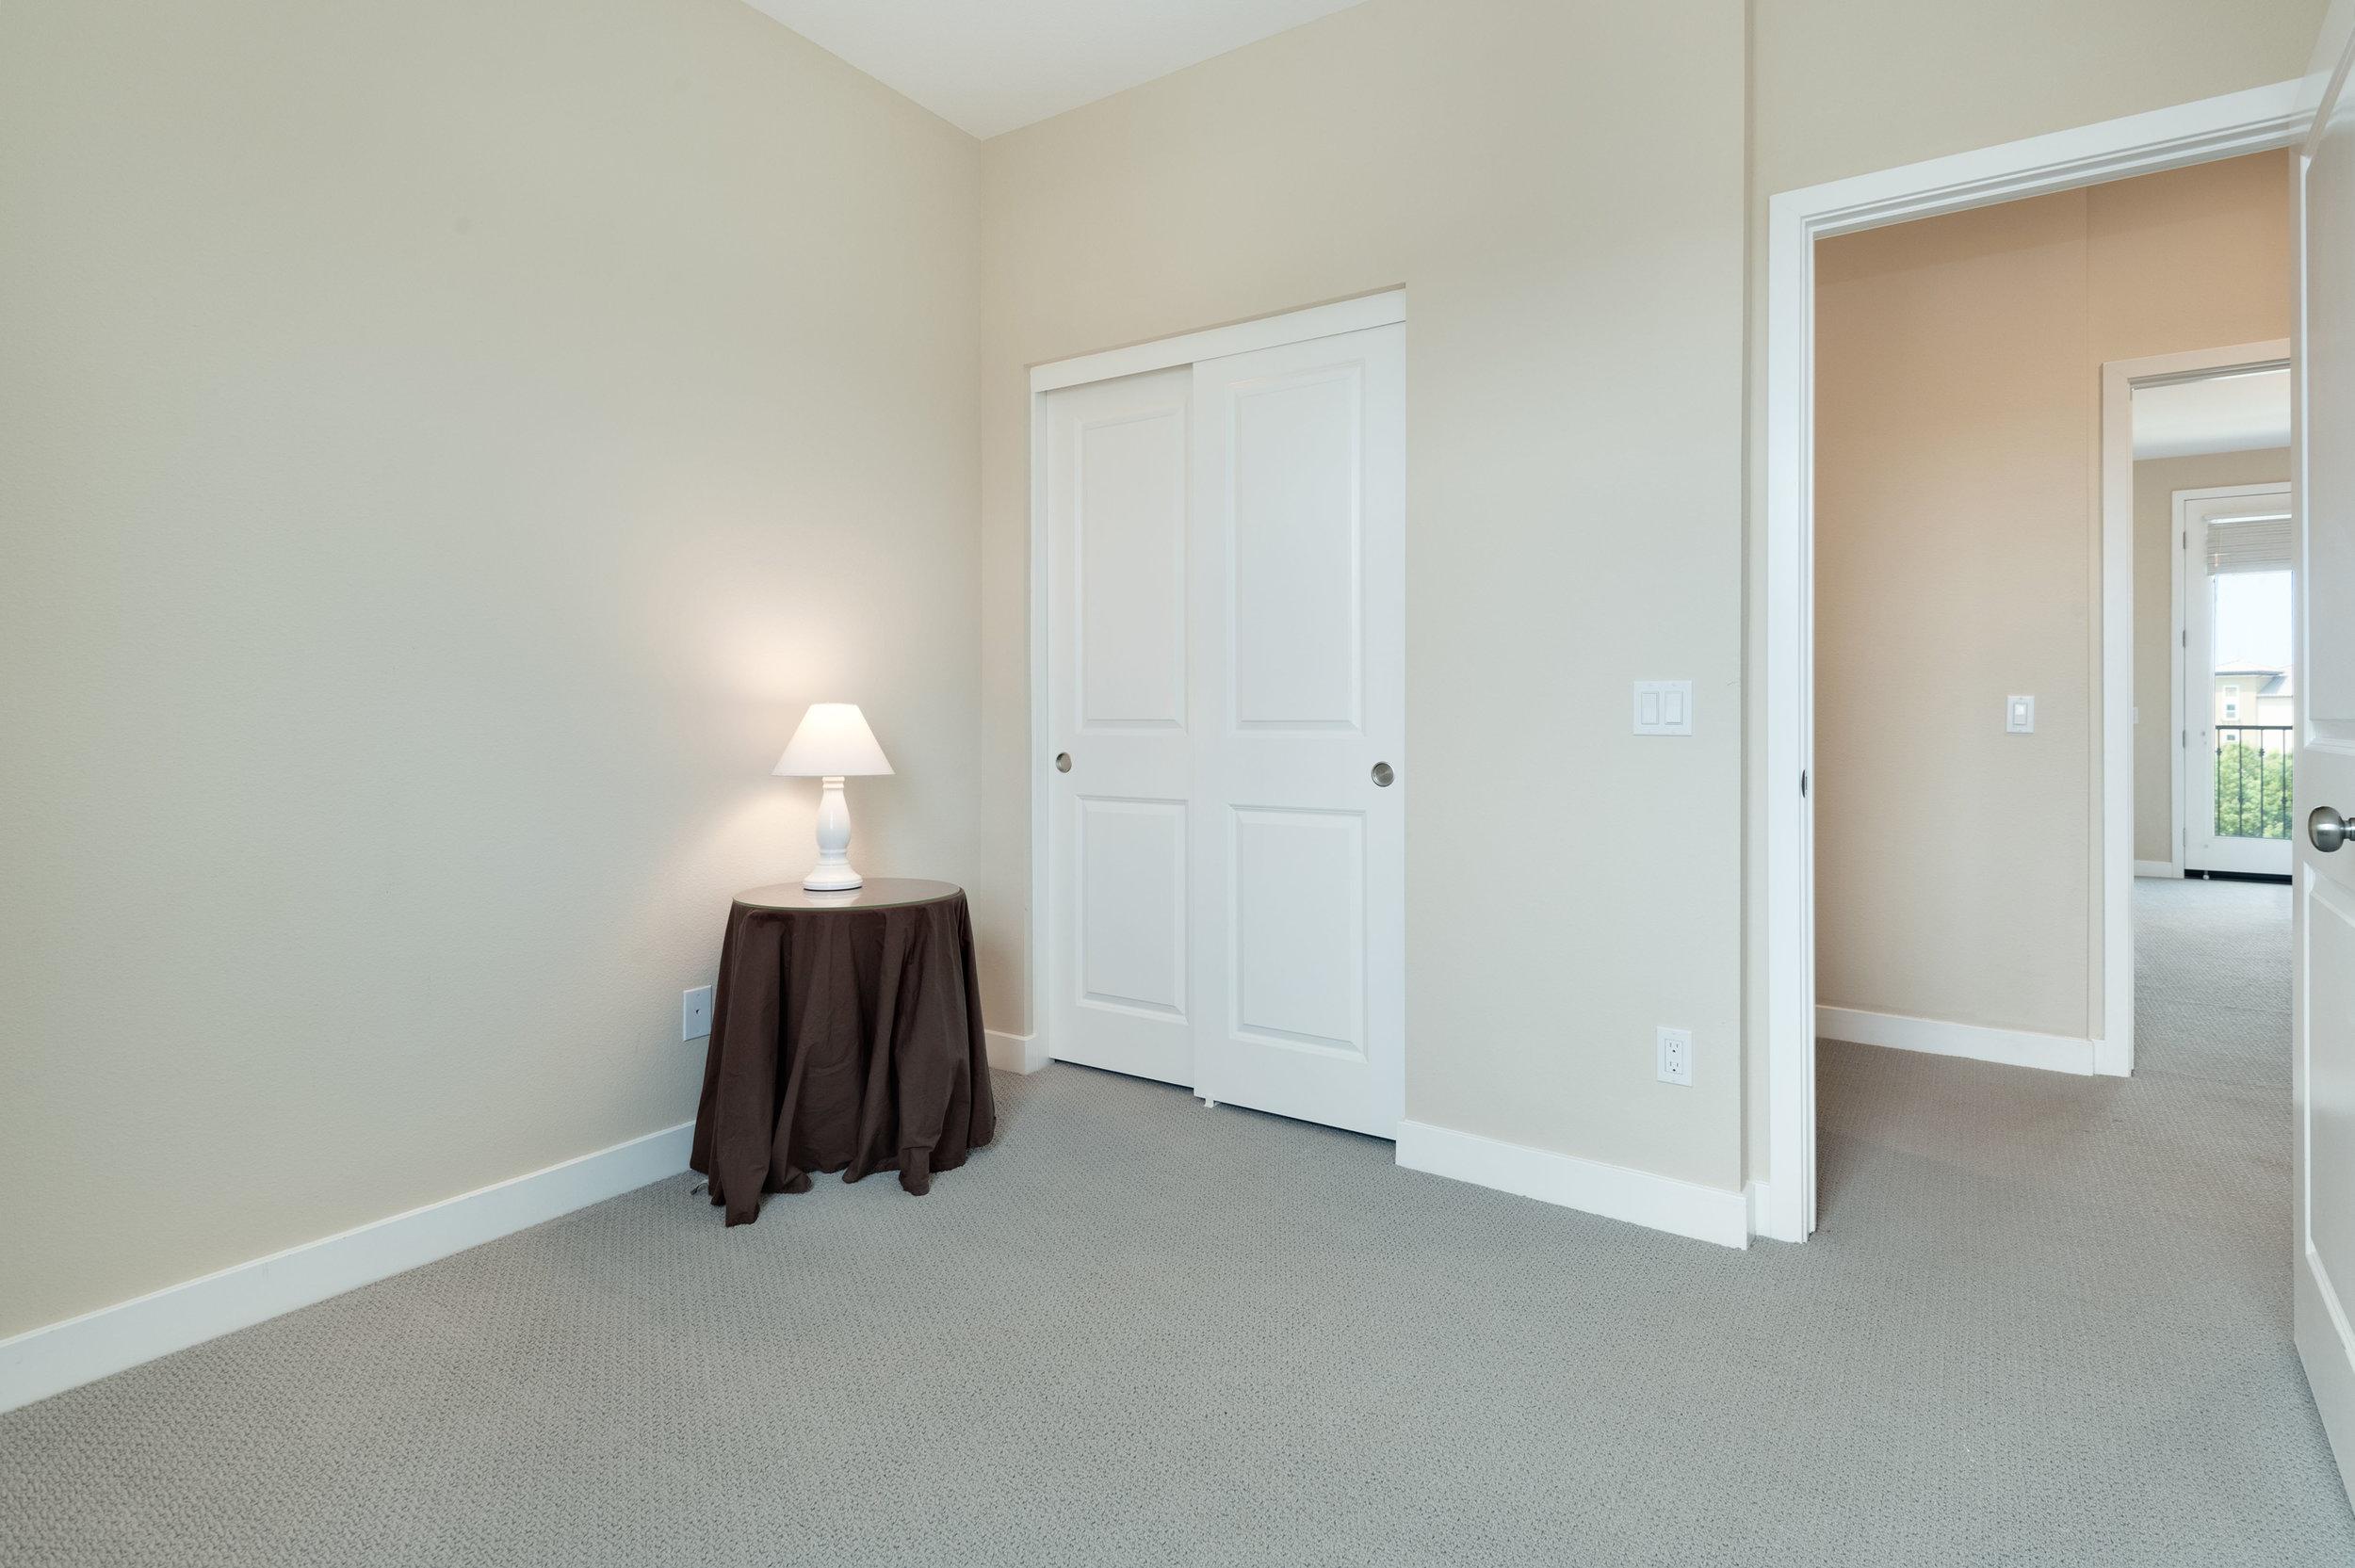 015 Bedroom 207 Westpark Court Unit 702 Camarillo Bally Khehra For Sale Lease The Malibu Life Team Luxury Real Estate.jpg